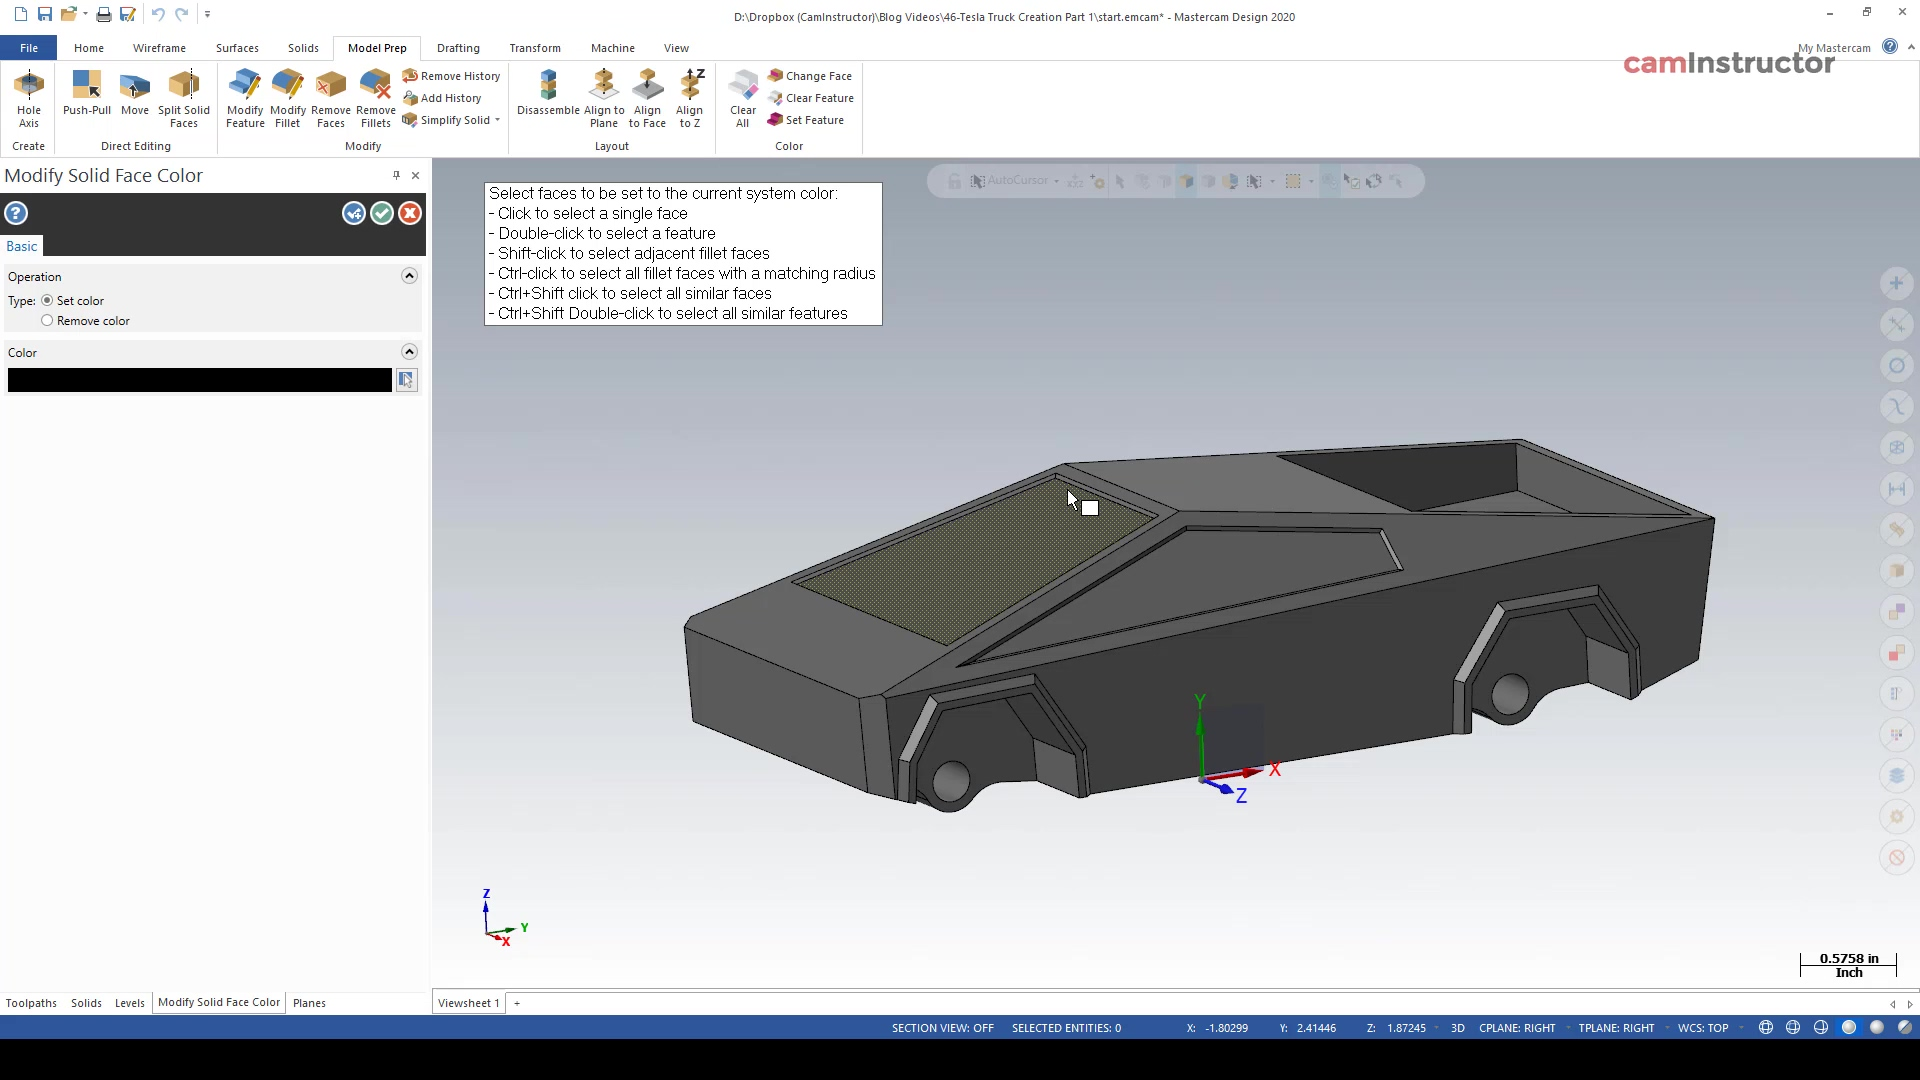 Tesla Truck Creation Part 5